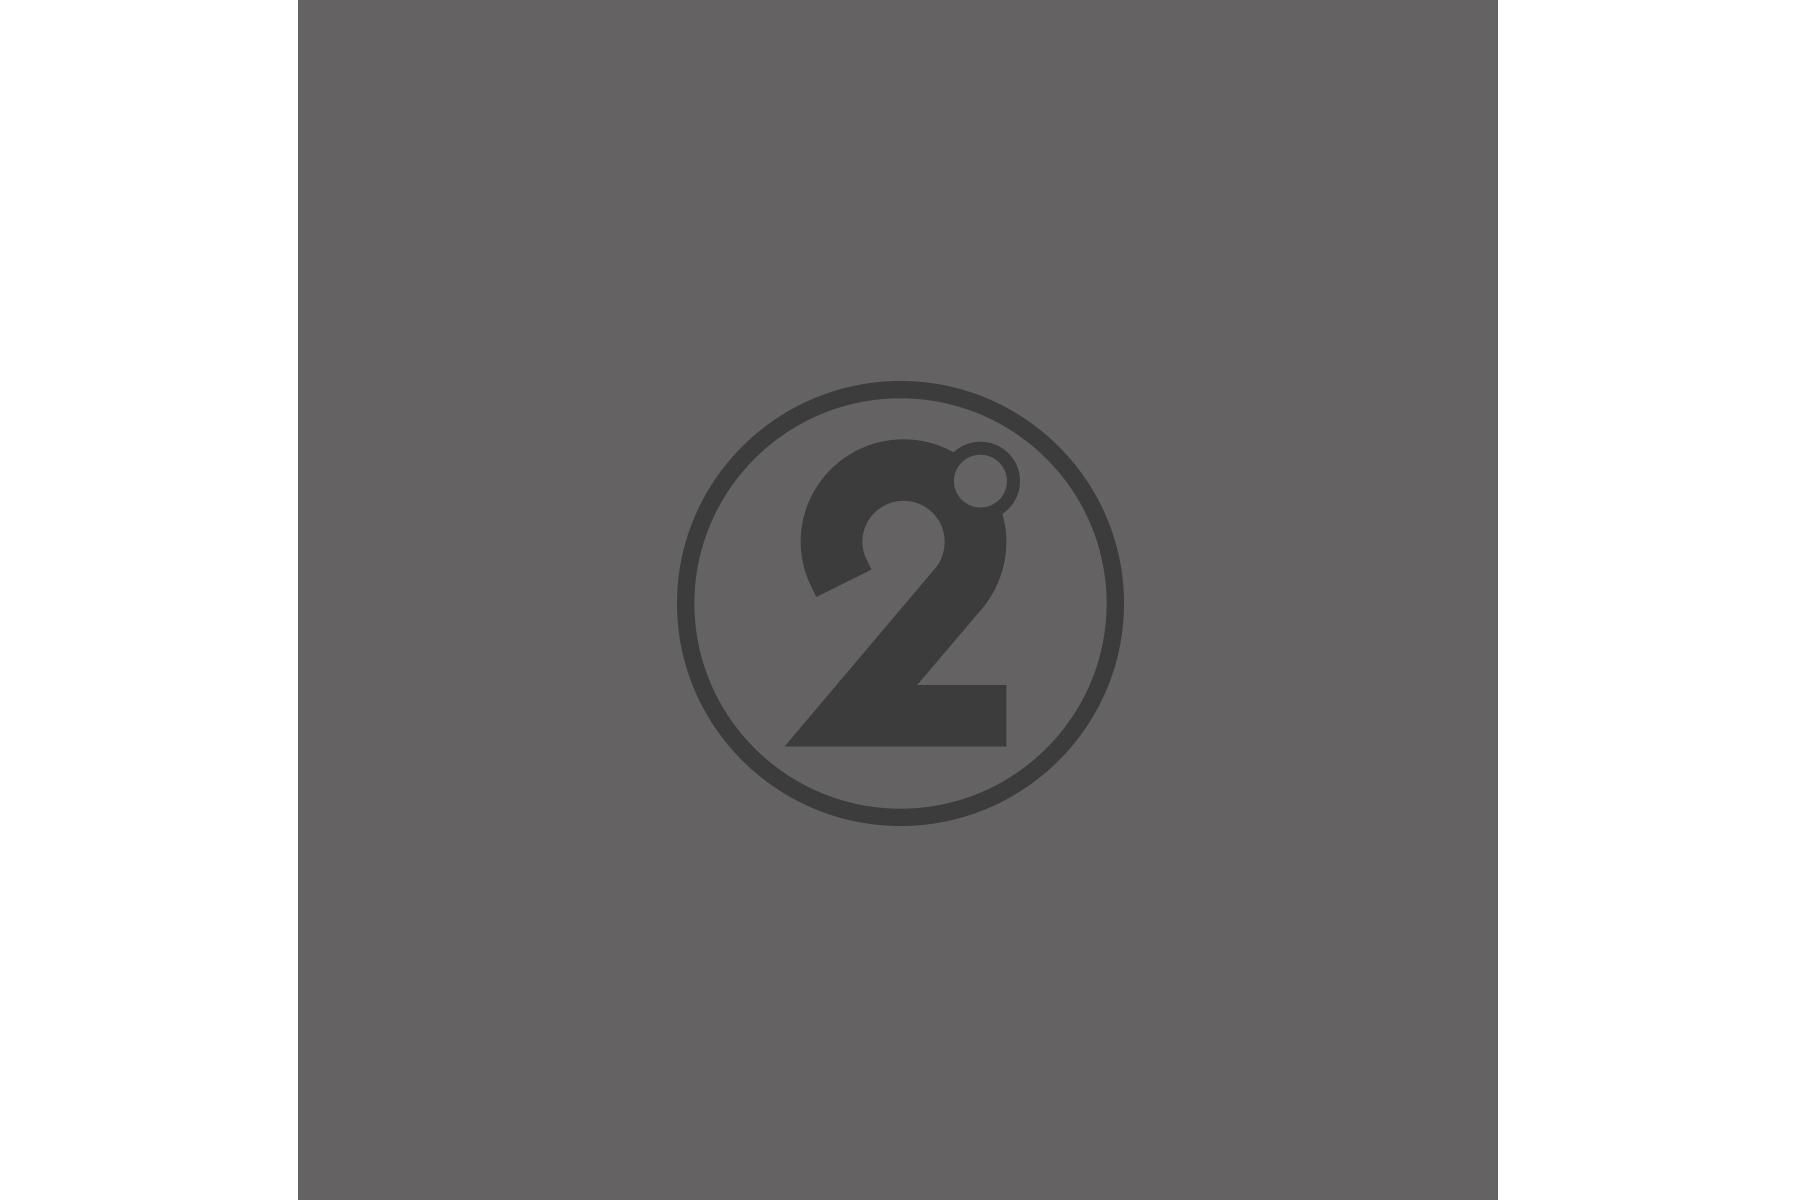 Logos_6x4_ColorBlock_2D.jpg